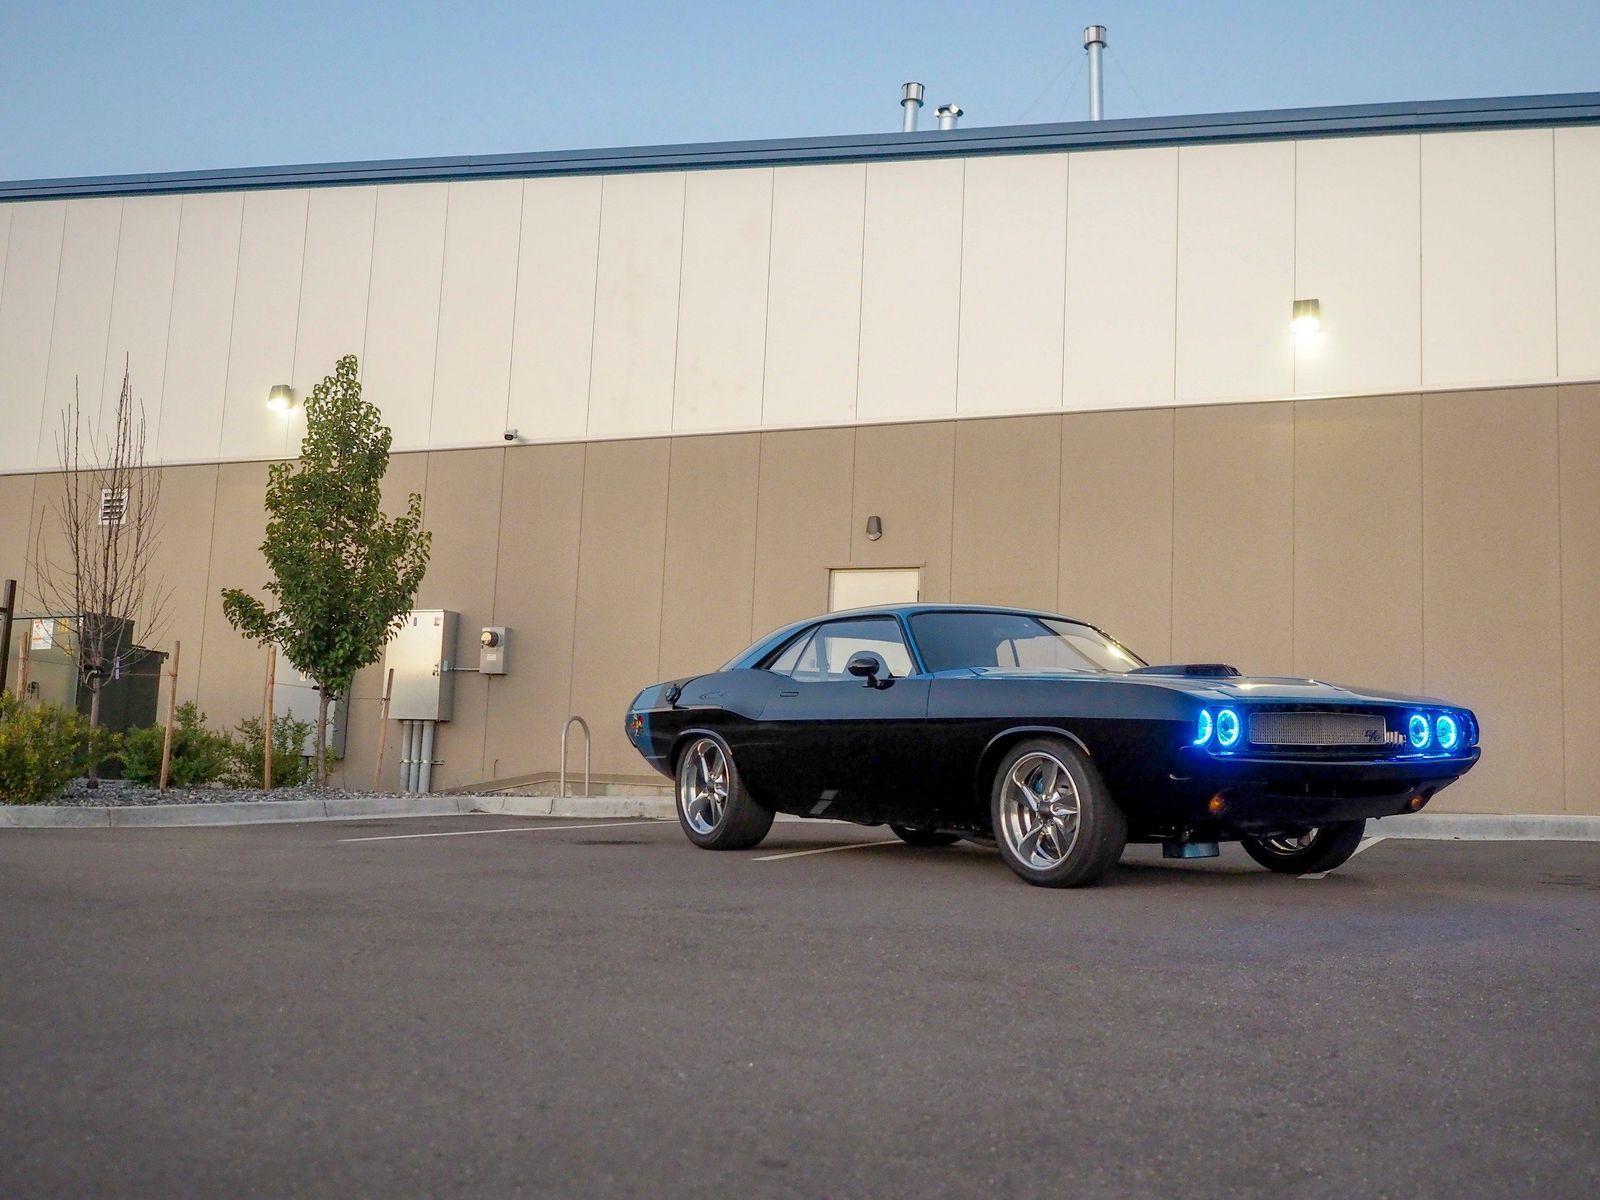 1970 Dodge Challenger Show Stopper Custom Restomod 5 Speed For Sale Dodge Challenger Custom Muscle Cars Challenger